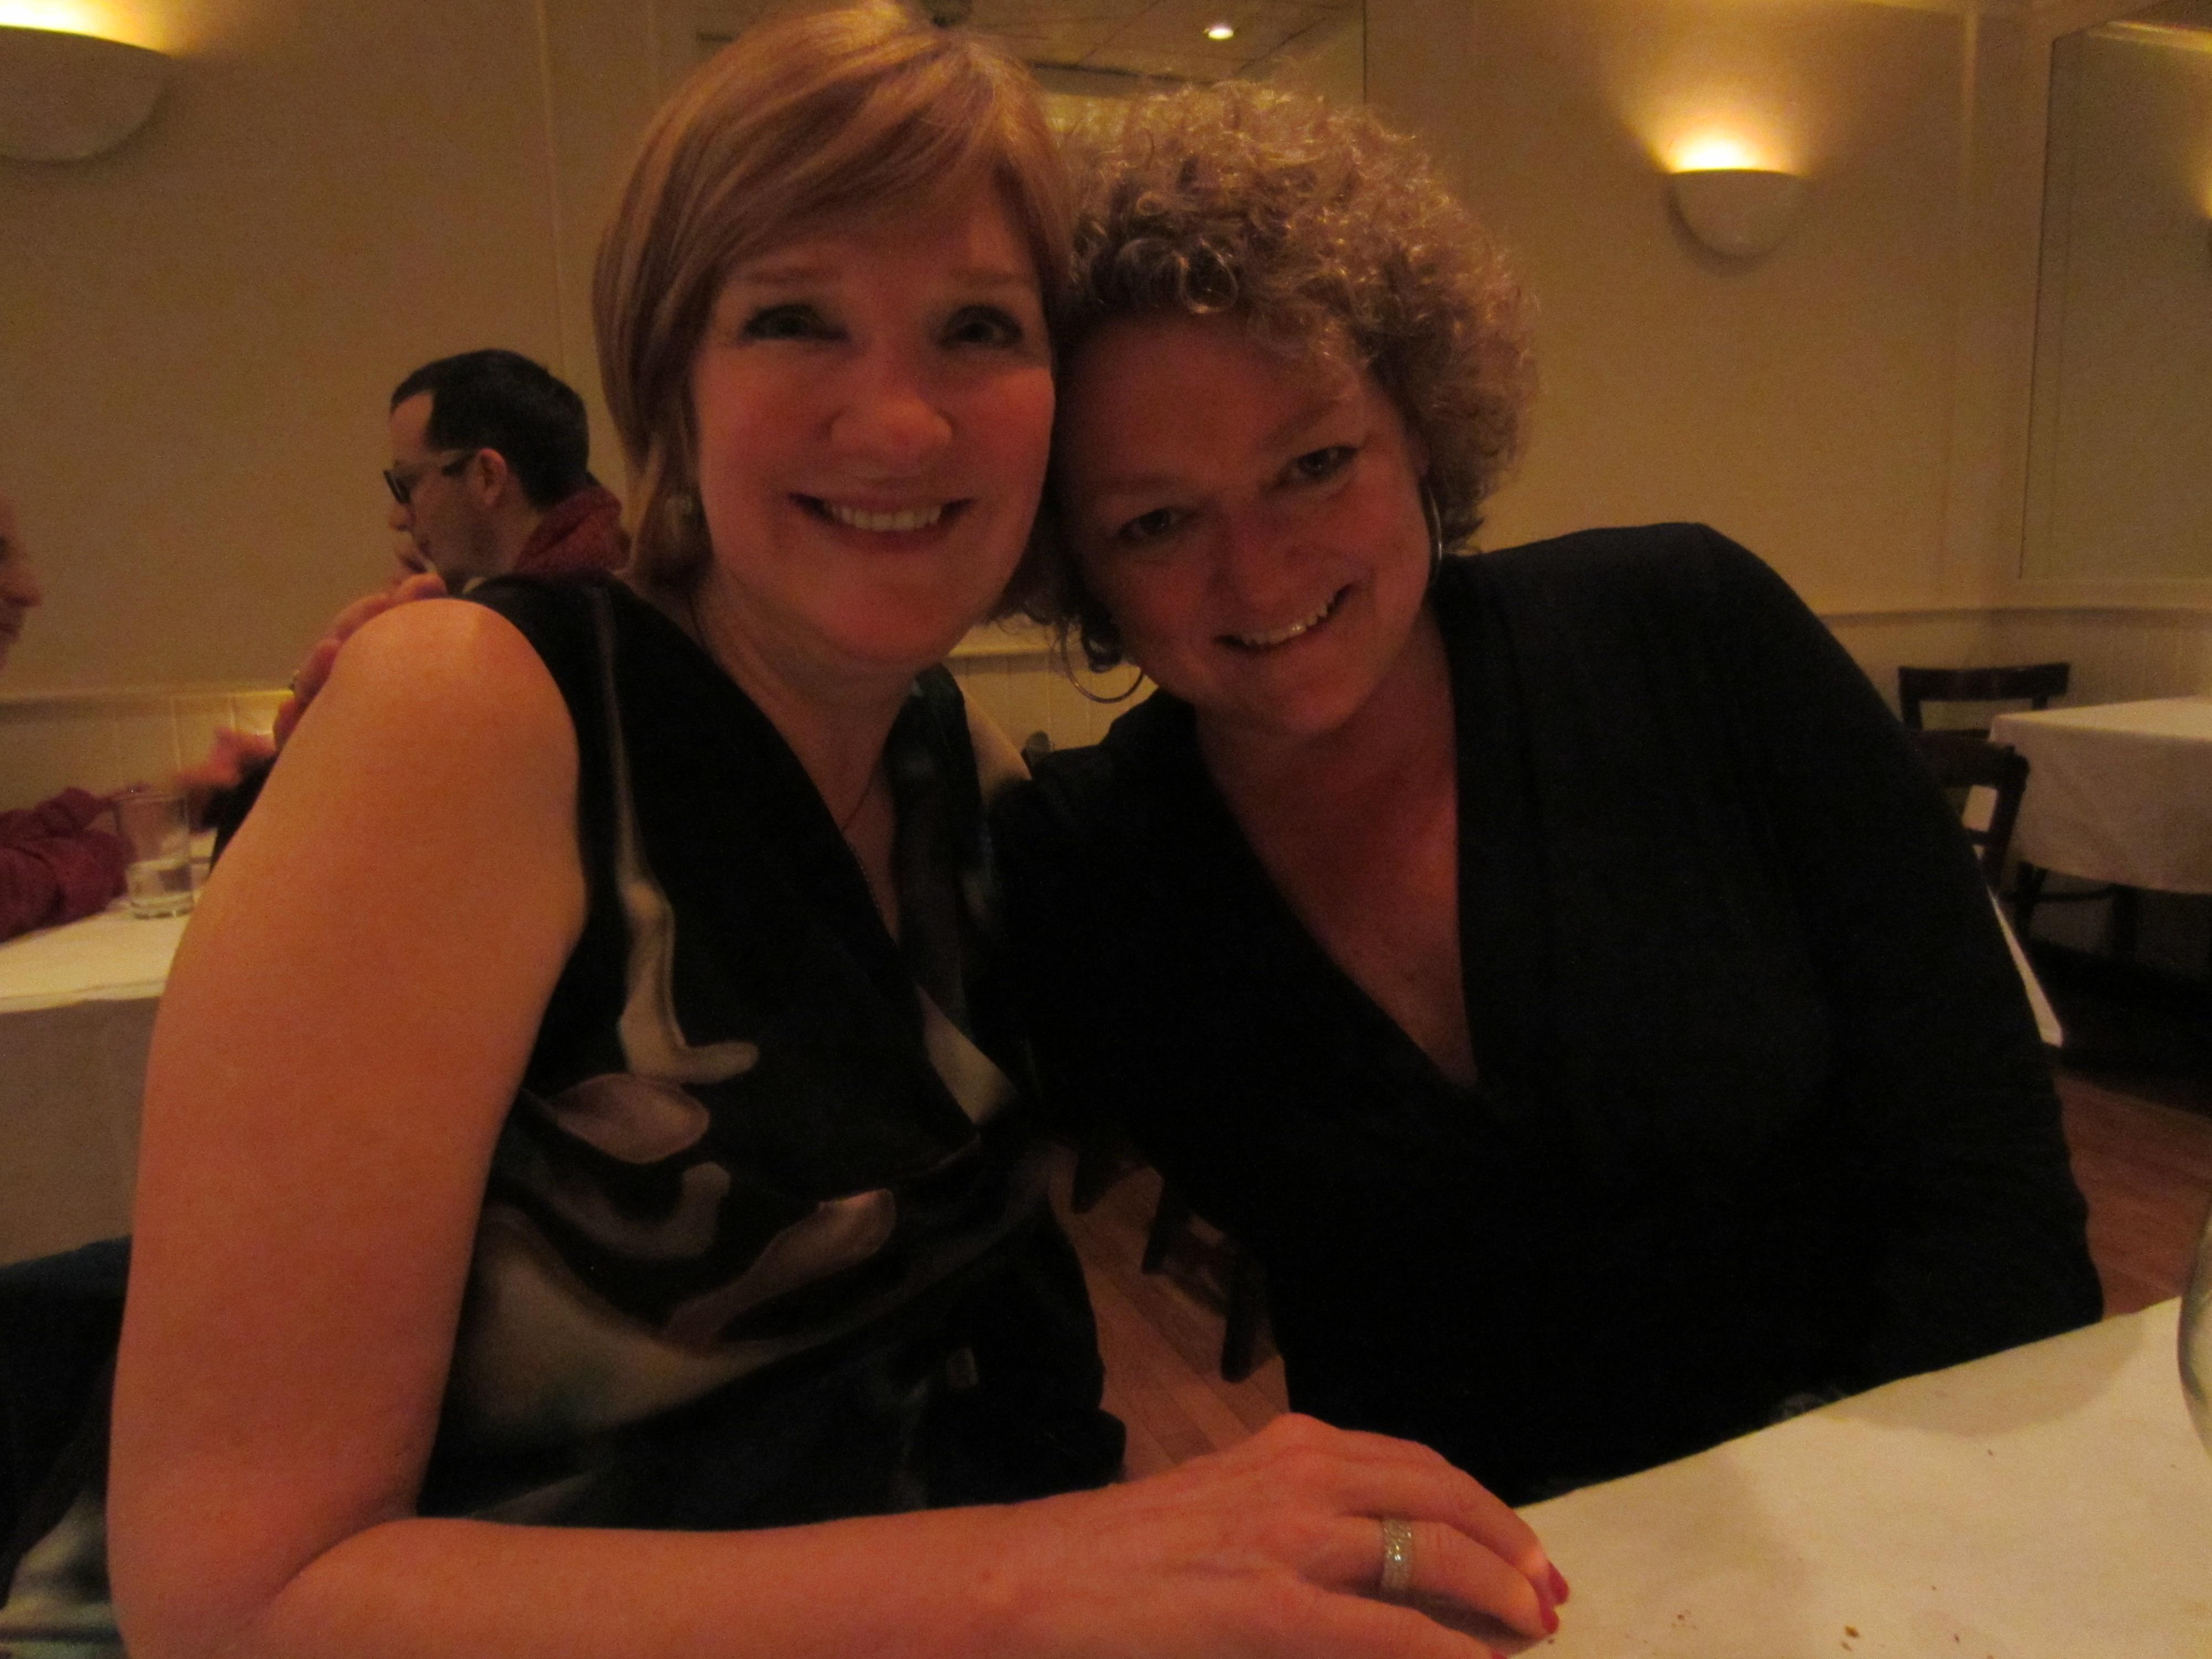 American Salon's Jamie Corkran and Jeannie Oberholtzer